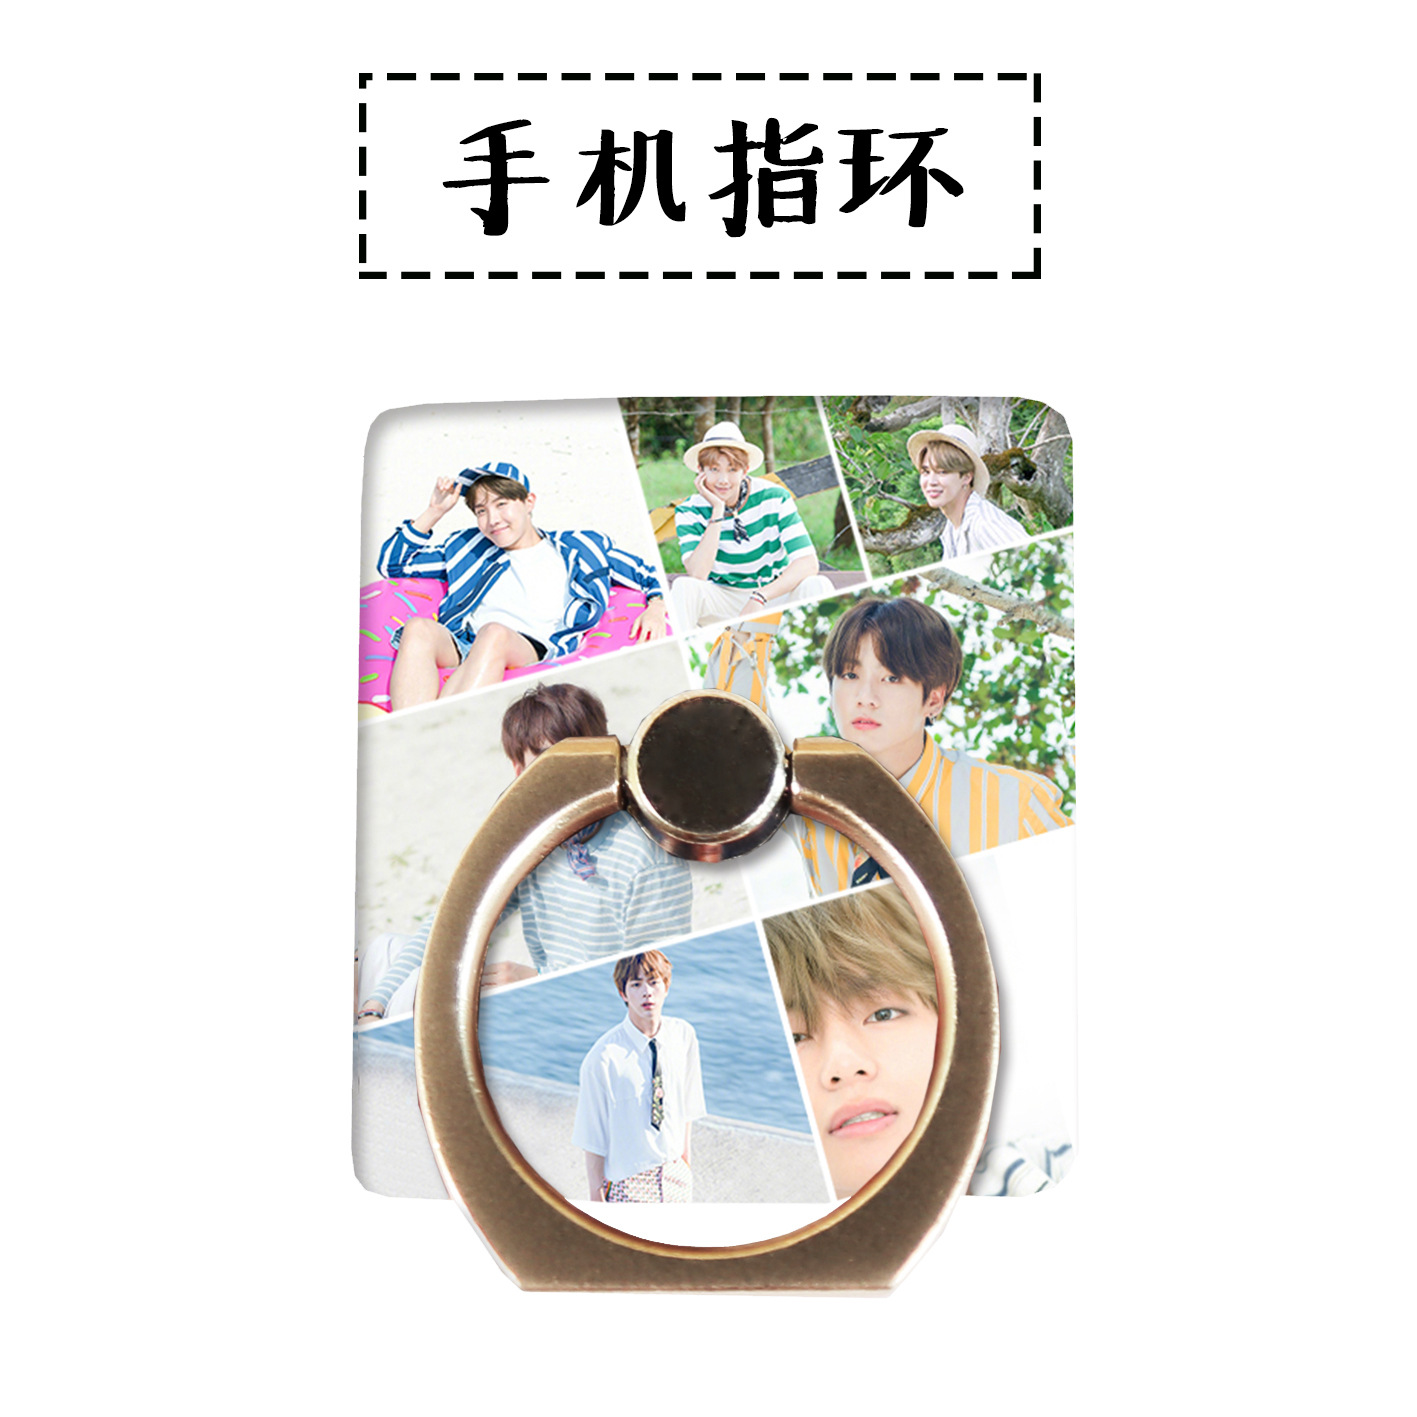 MYKPOP]BTS 360 Degree rotate Mobile Phone Desk Holder Finger Ring Holder for all Smart Phones KPOP Collection SA18061310